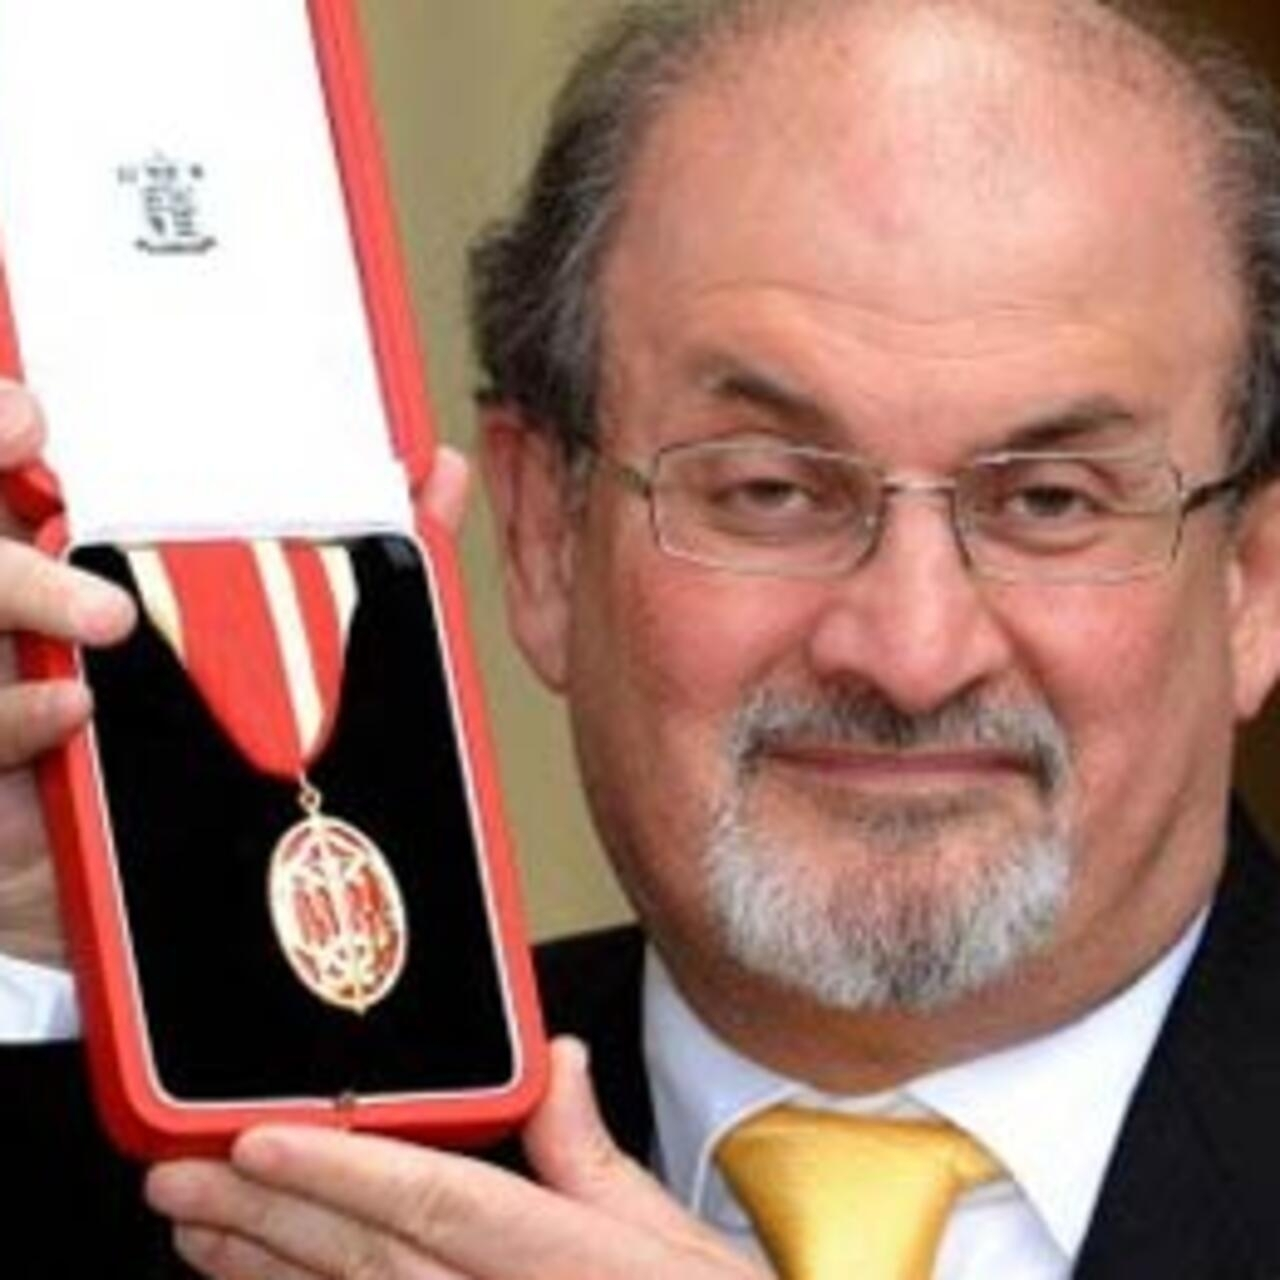 Queen grants Salman Rushdie knighthood